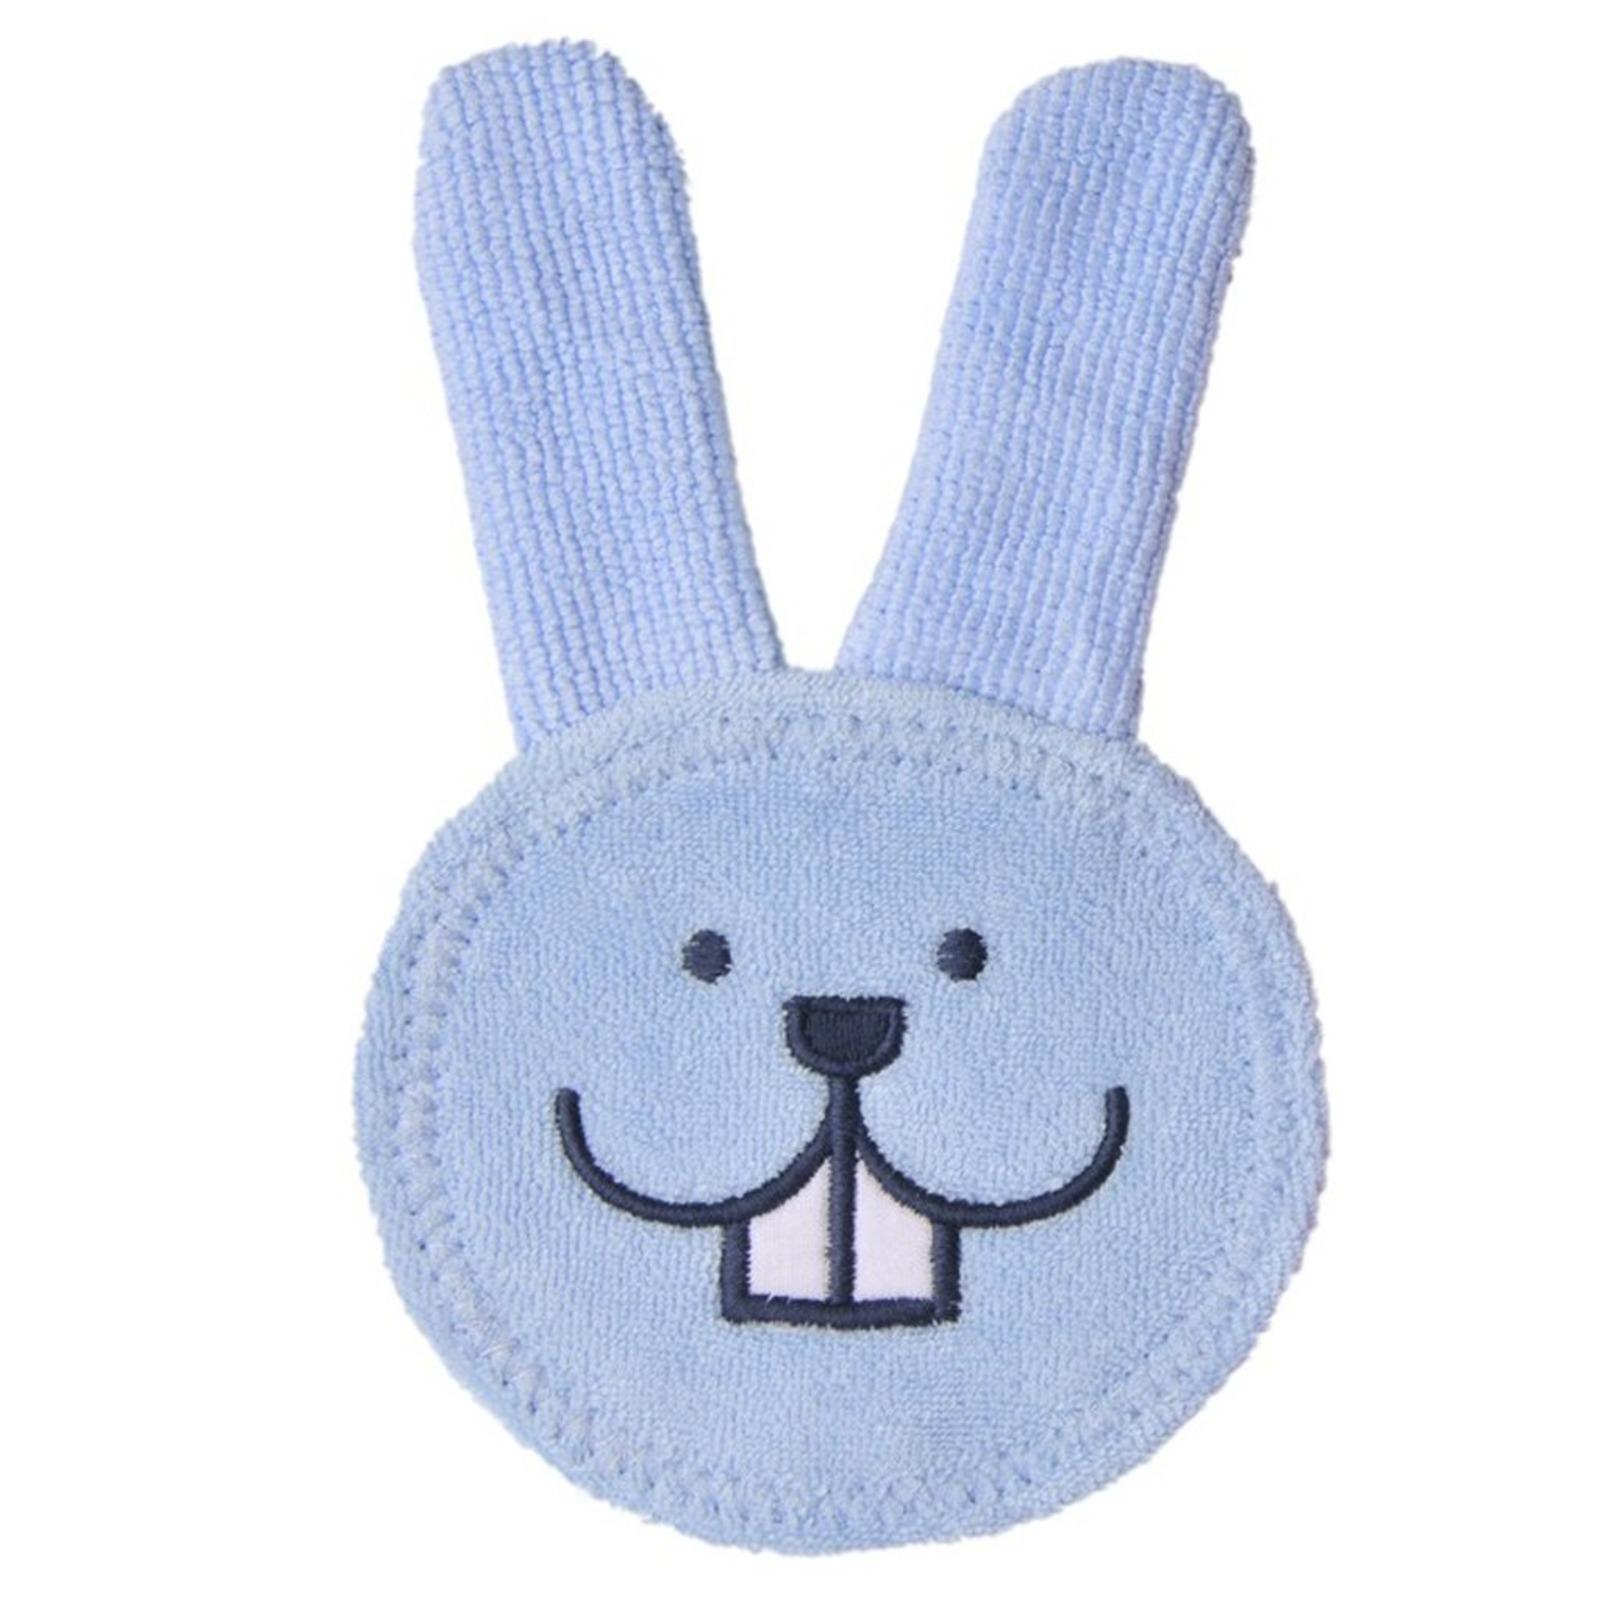 MAM Oral Care Rabbit Teething Glove - Blue